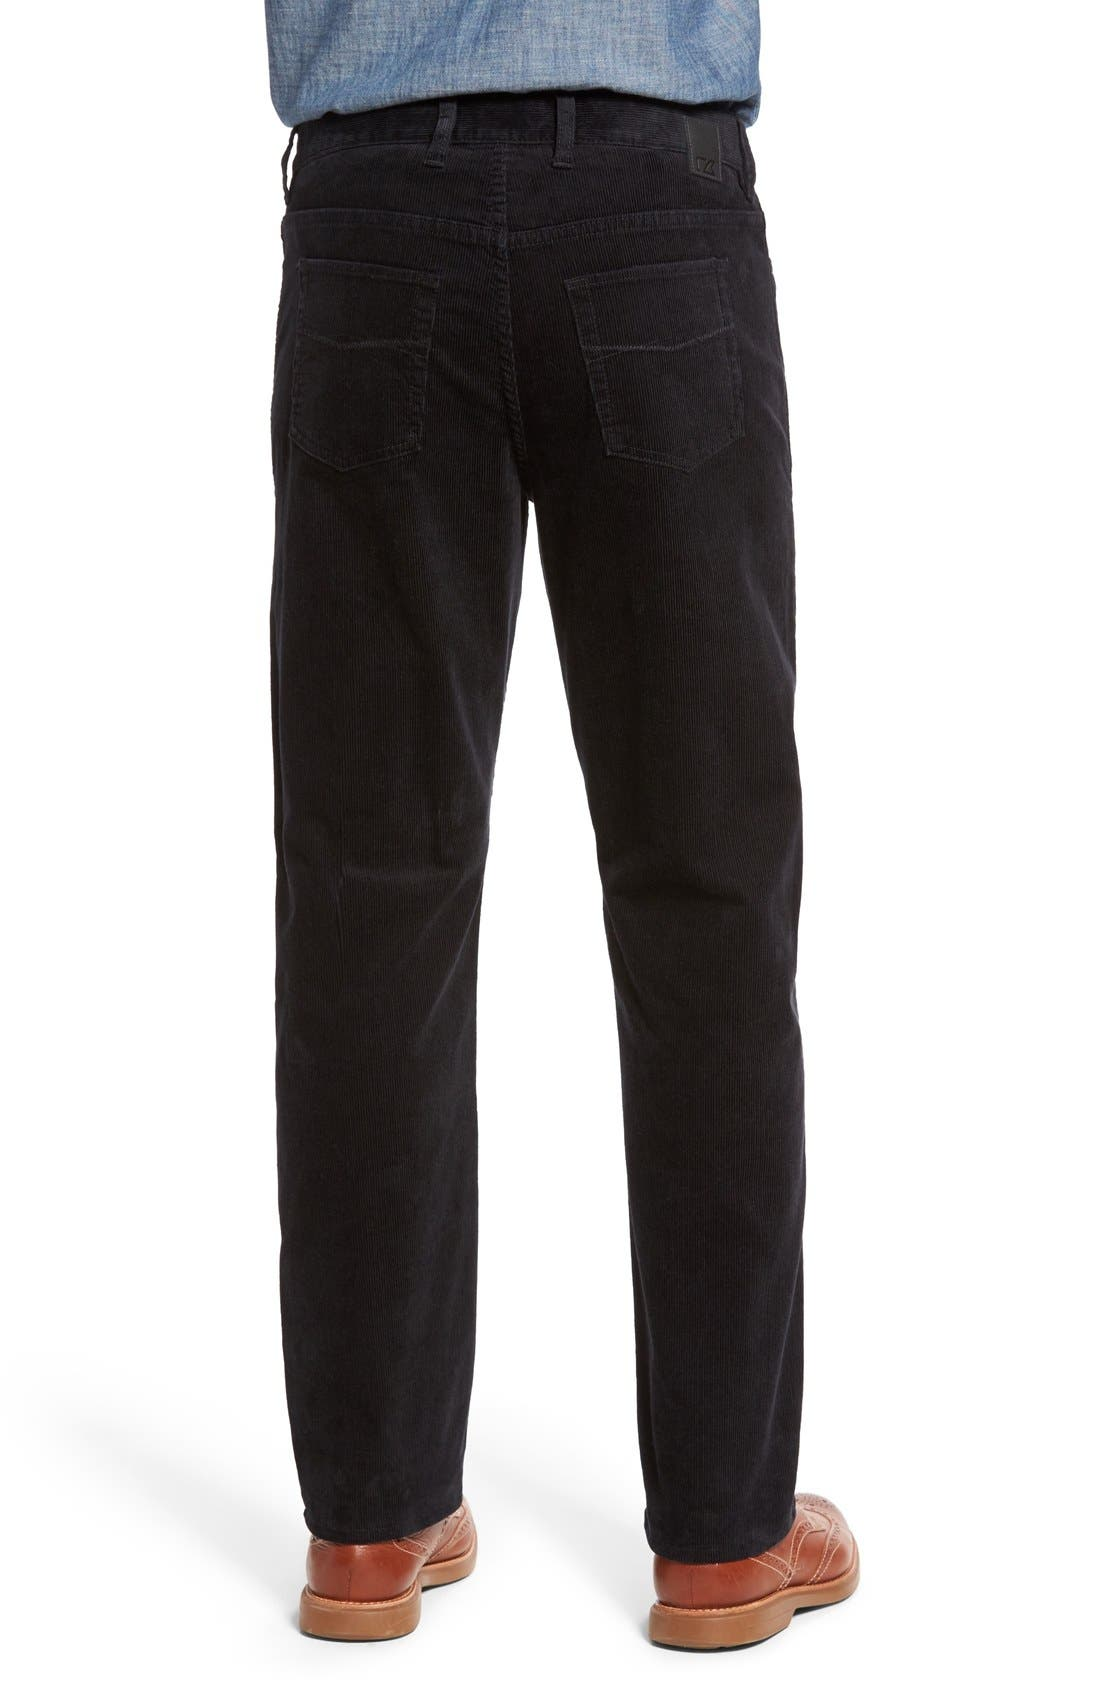 Greenwood Stretch Corduroy Pants,                             Alternate thumbnail 4, color,                             001